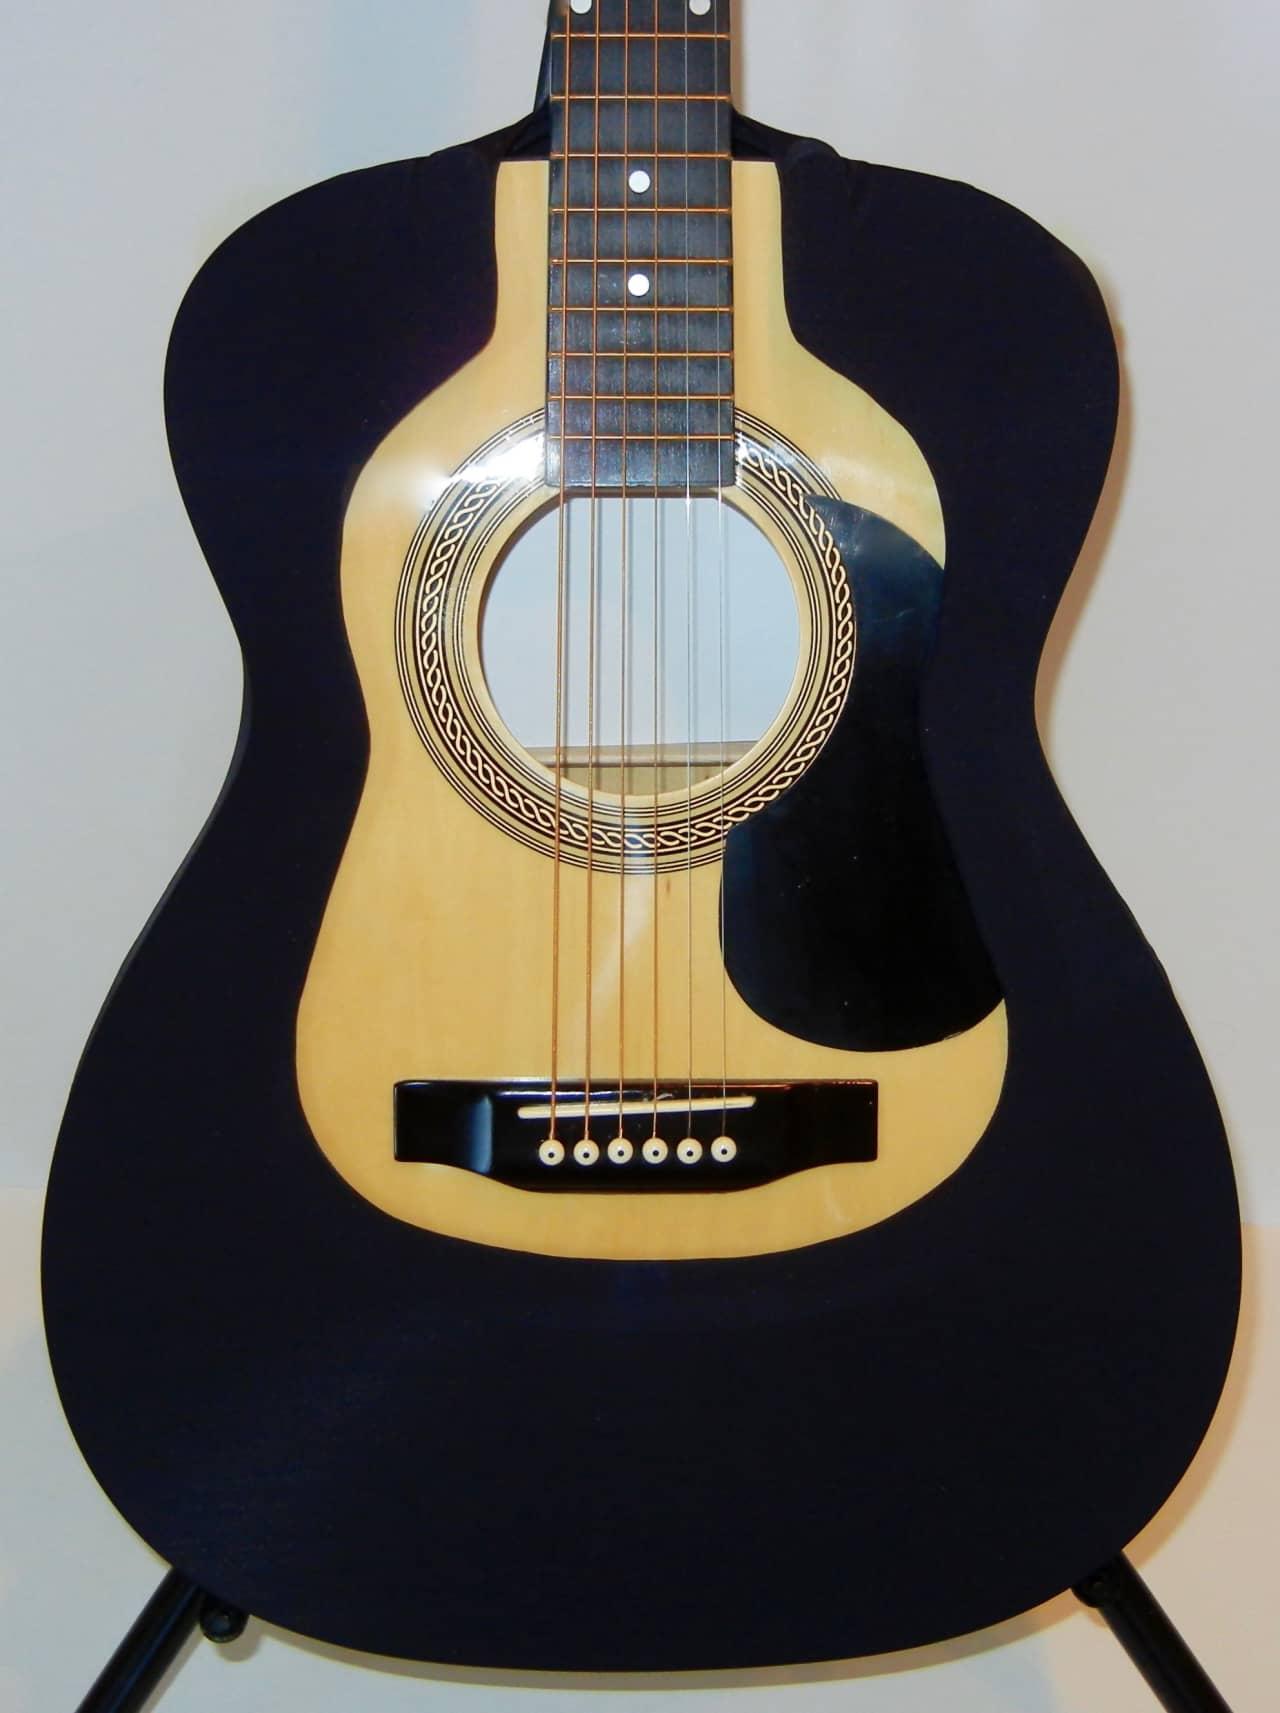 Acoustic Guitar Covers : acoustic guitar cover vest black 000 om fits martin reverb ~ Vivirlamusica.com Haus und Dekorationen